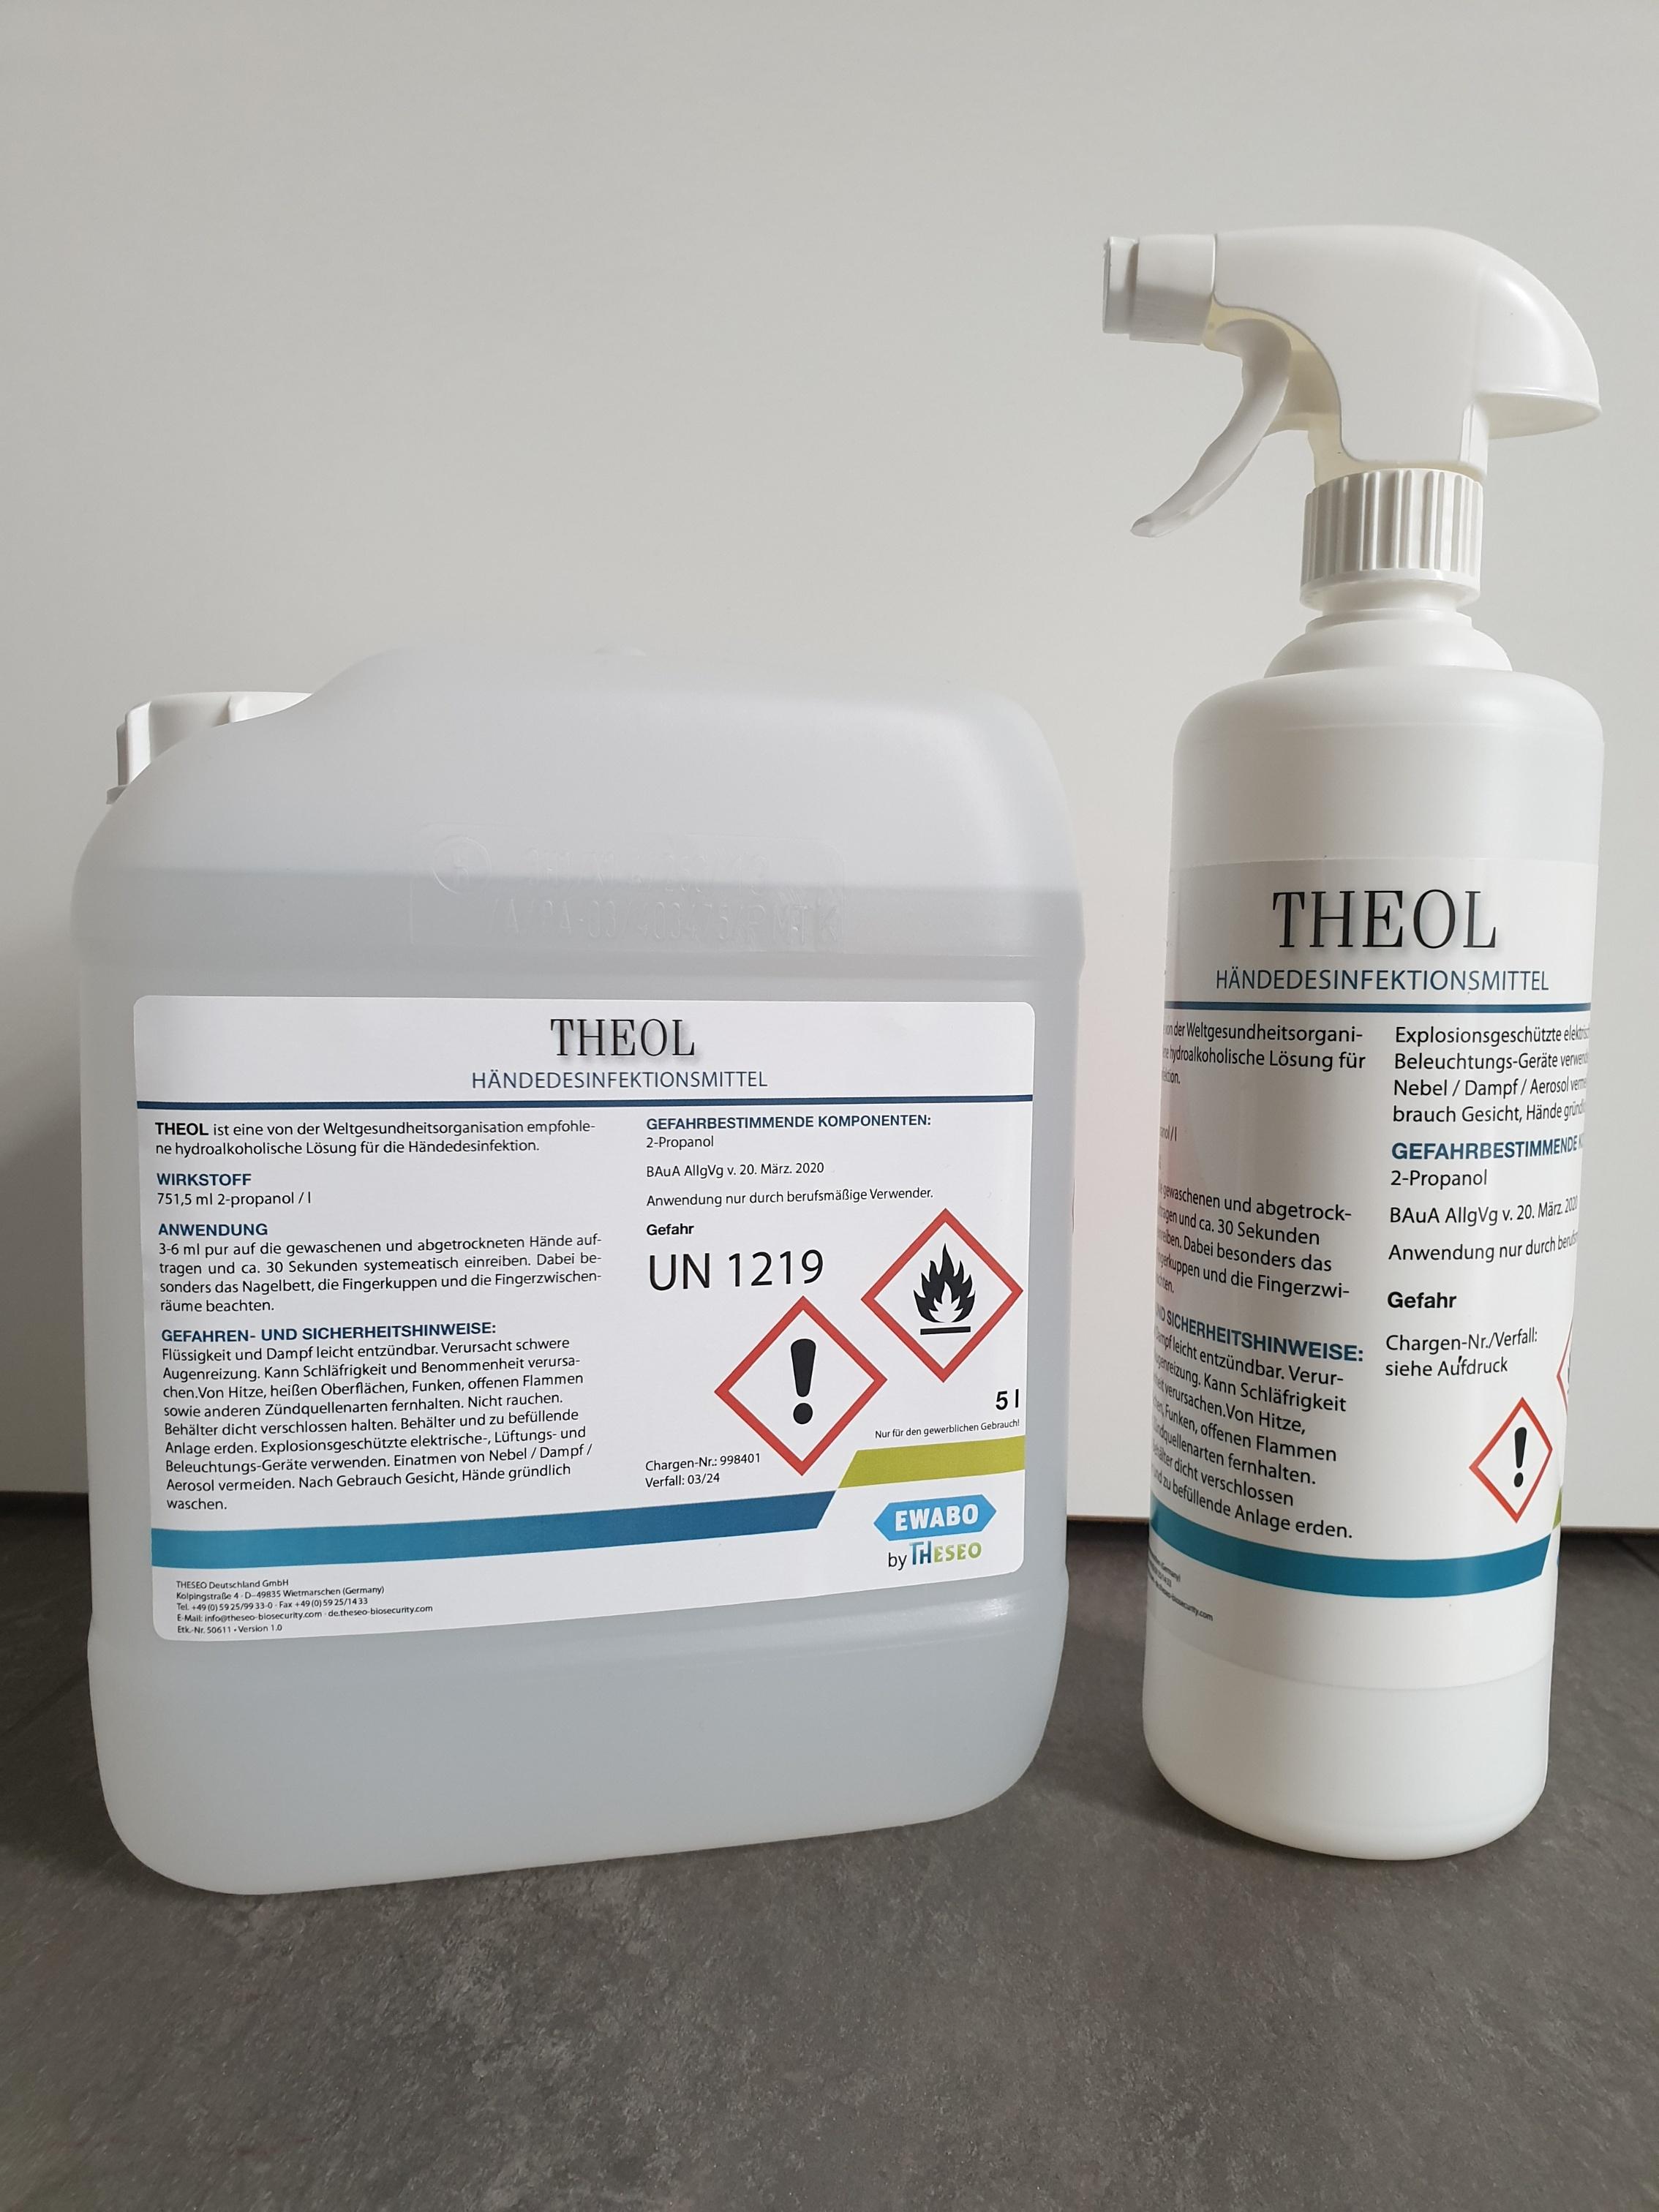 Theol Händedesinfektionsmittel